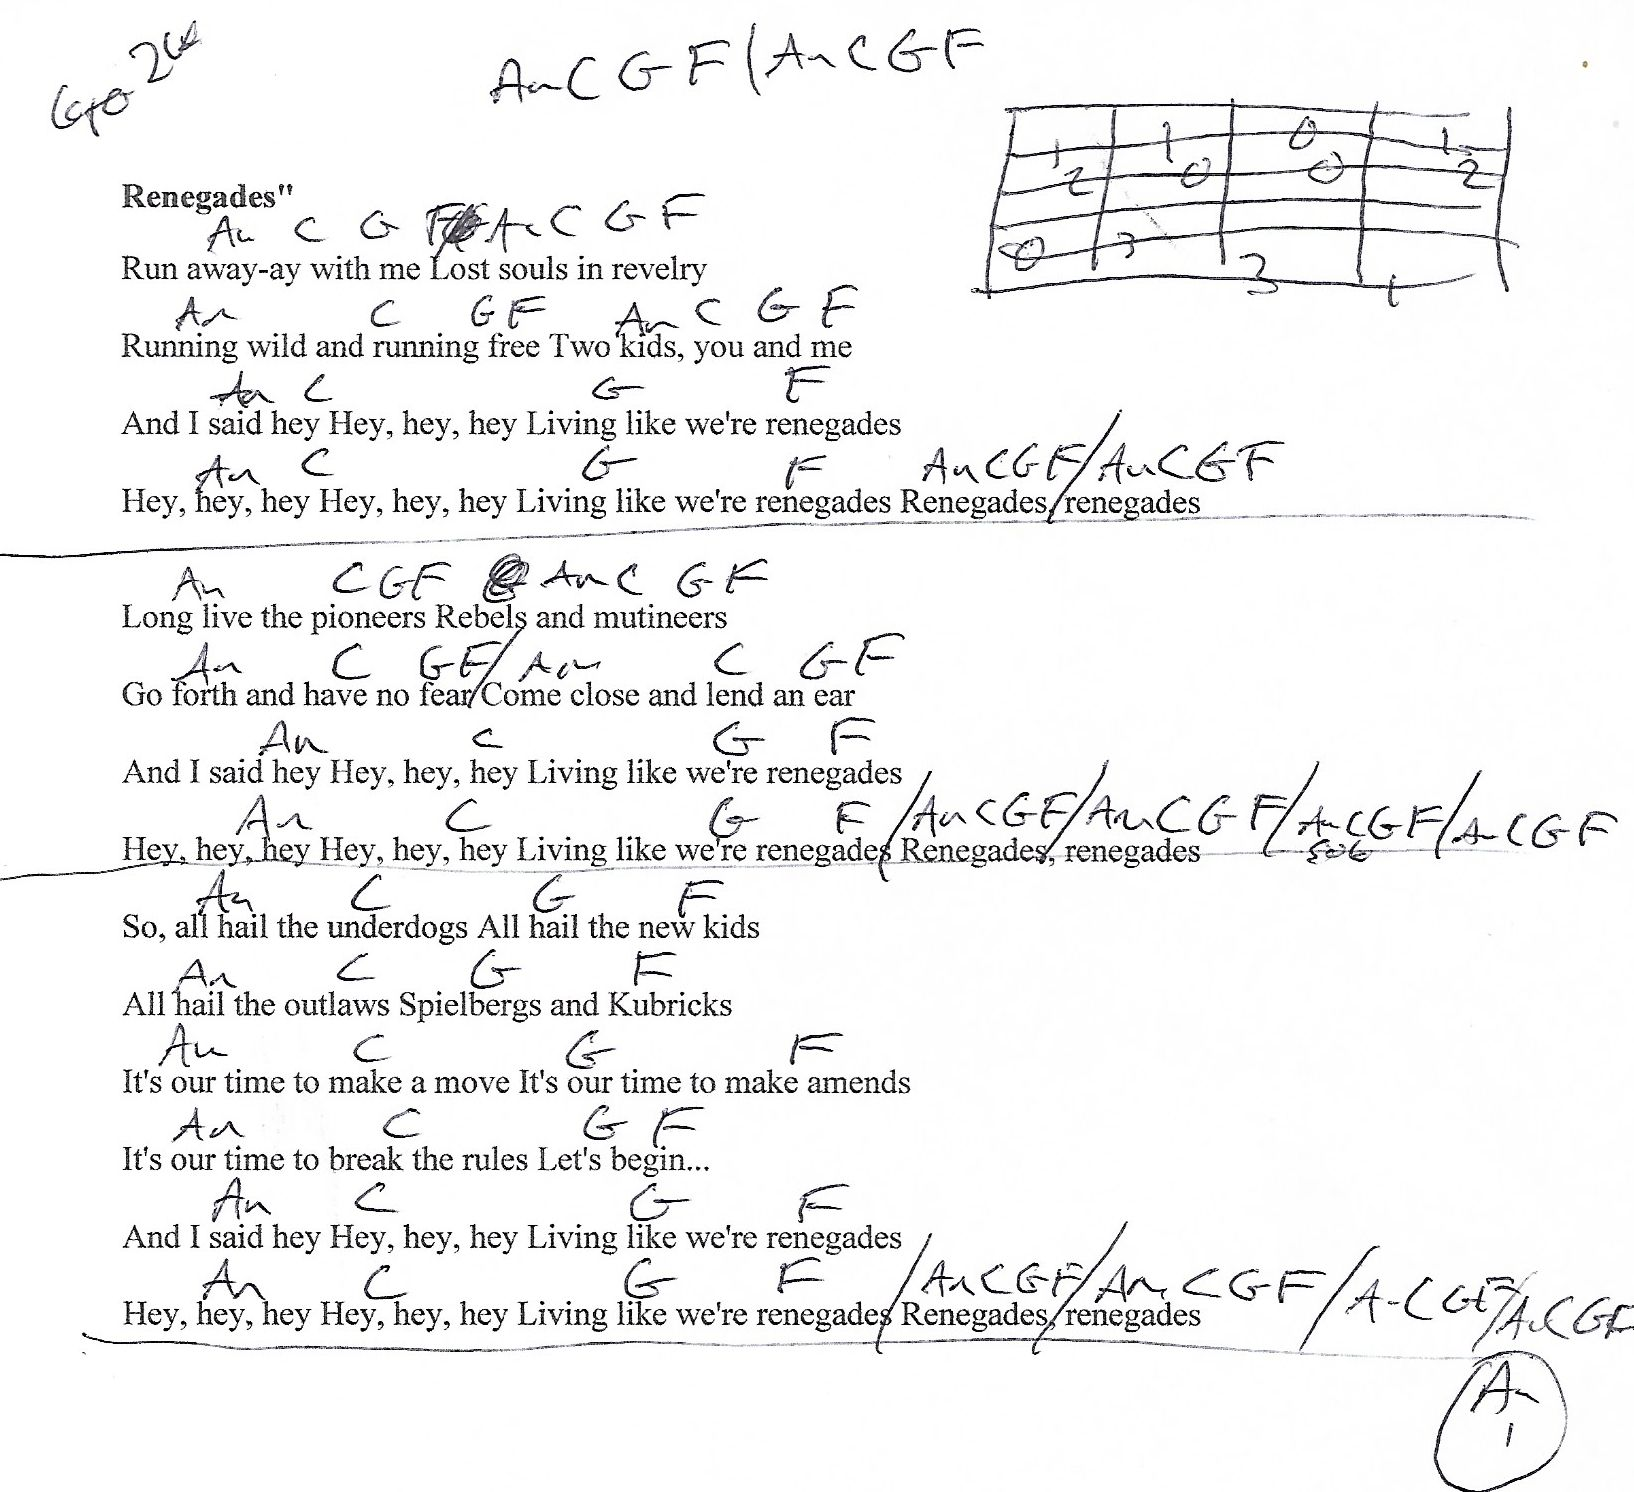 Renegades x ambassadors capo 2nd guitar chord chart with renegades x ambassadors capo 2nd guitar chord chart with lyrics http hexwebz Image collections